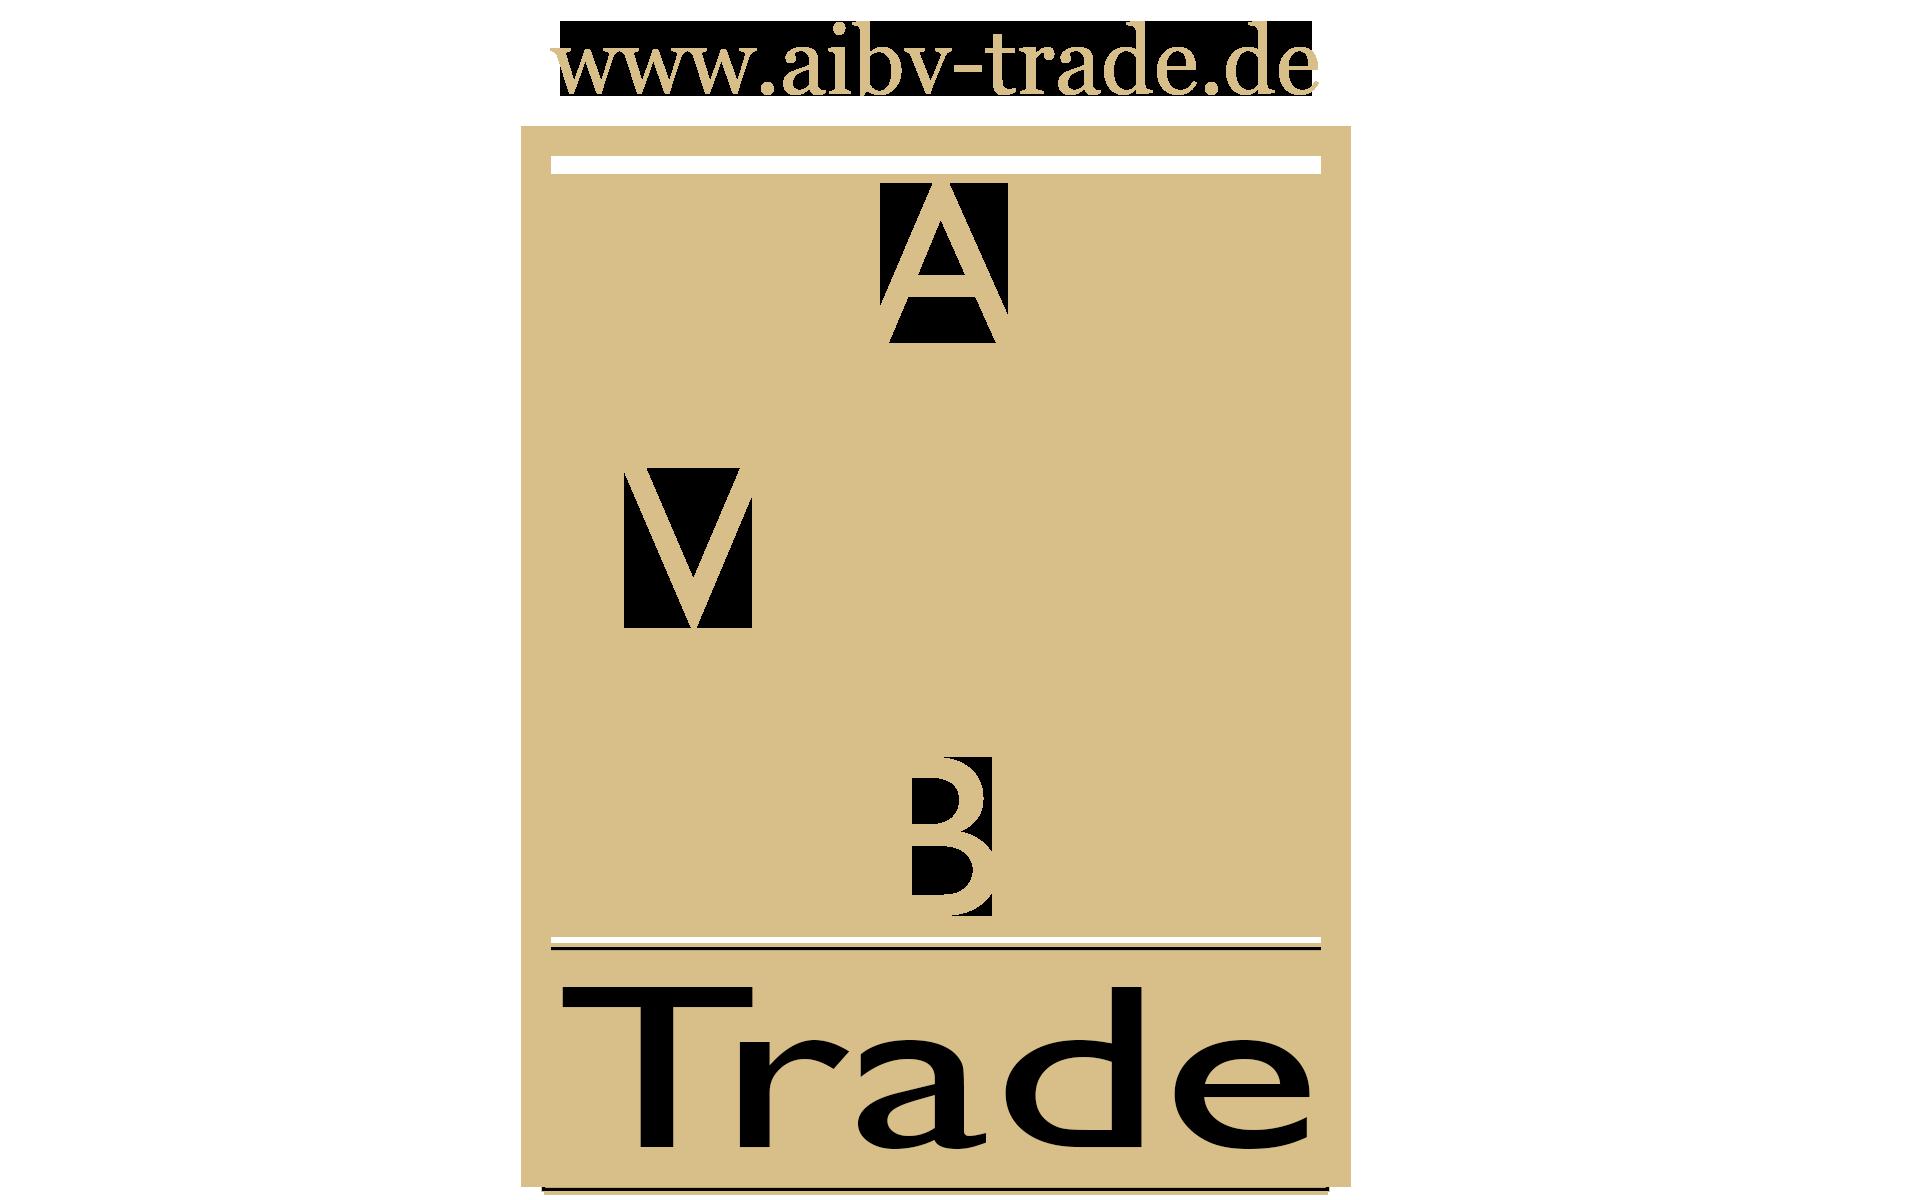 AIBV-Trade GmbH Logo